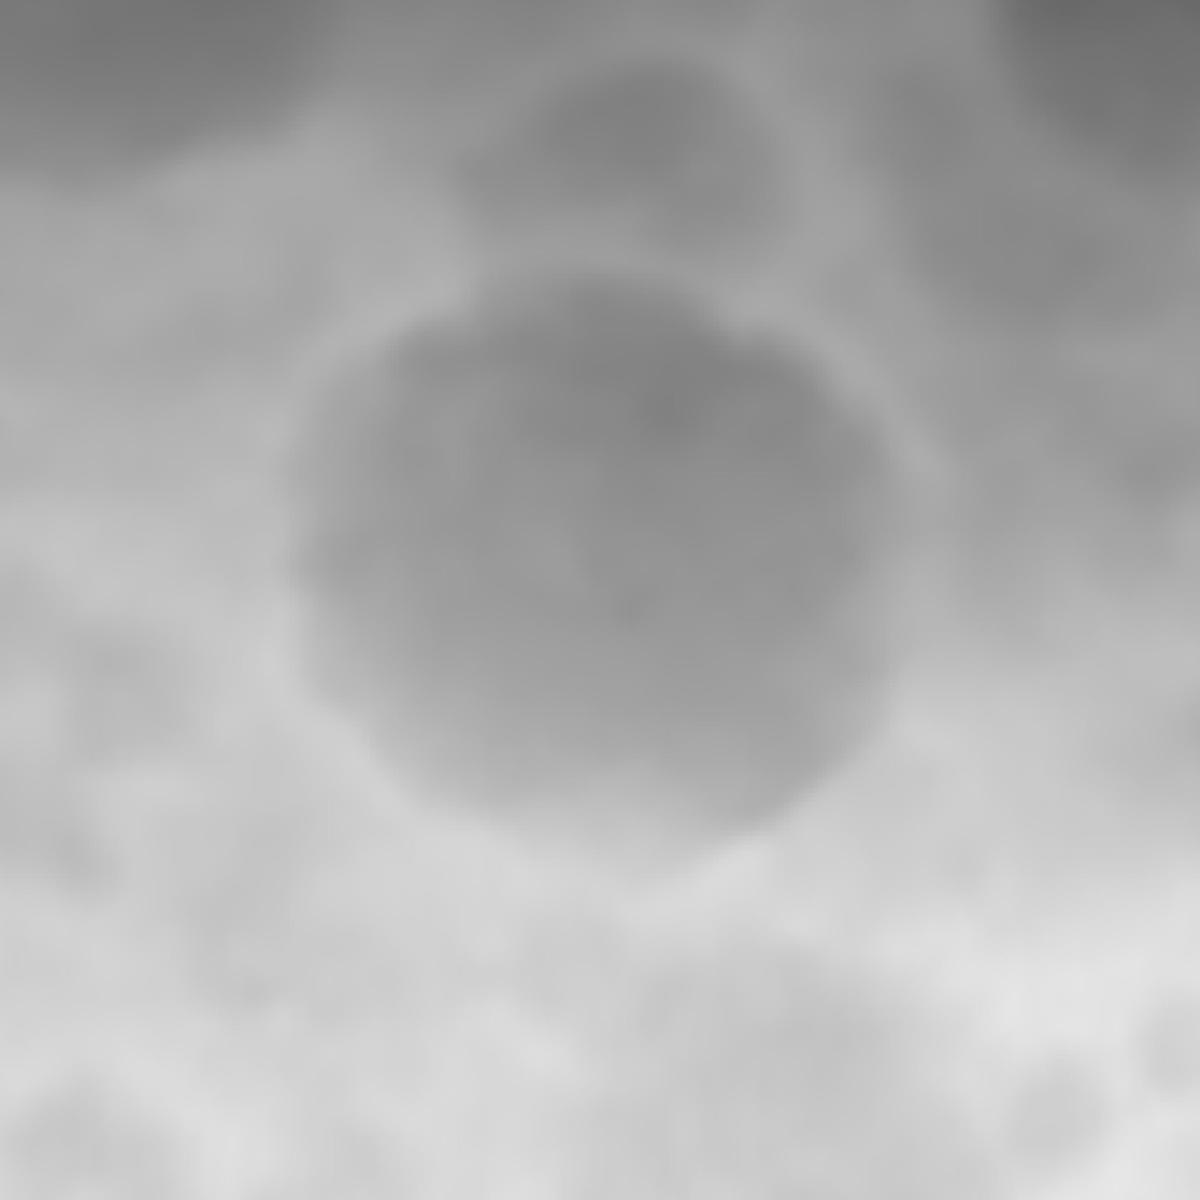 depth.thumb.jpg.dd970b6929c8f466d6c131e57132a477.jpg